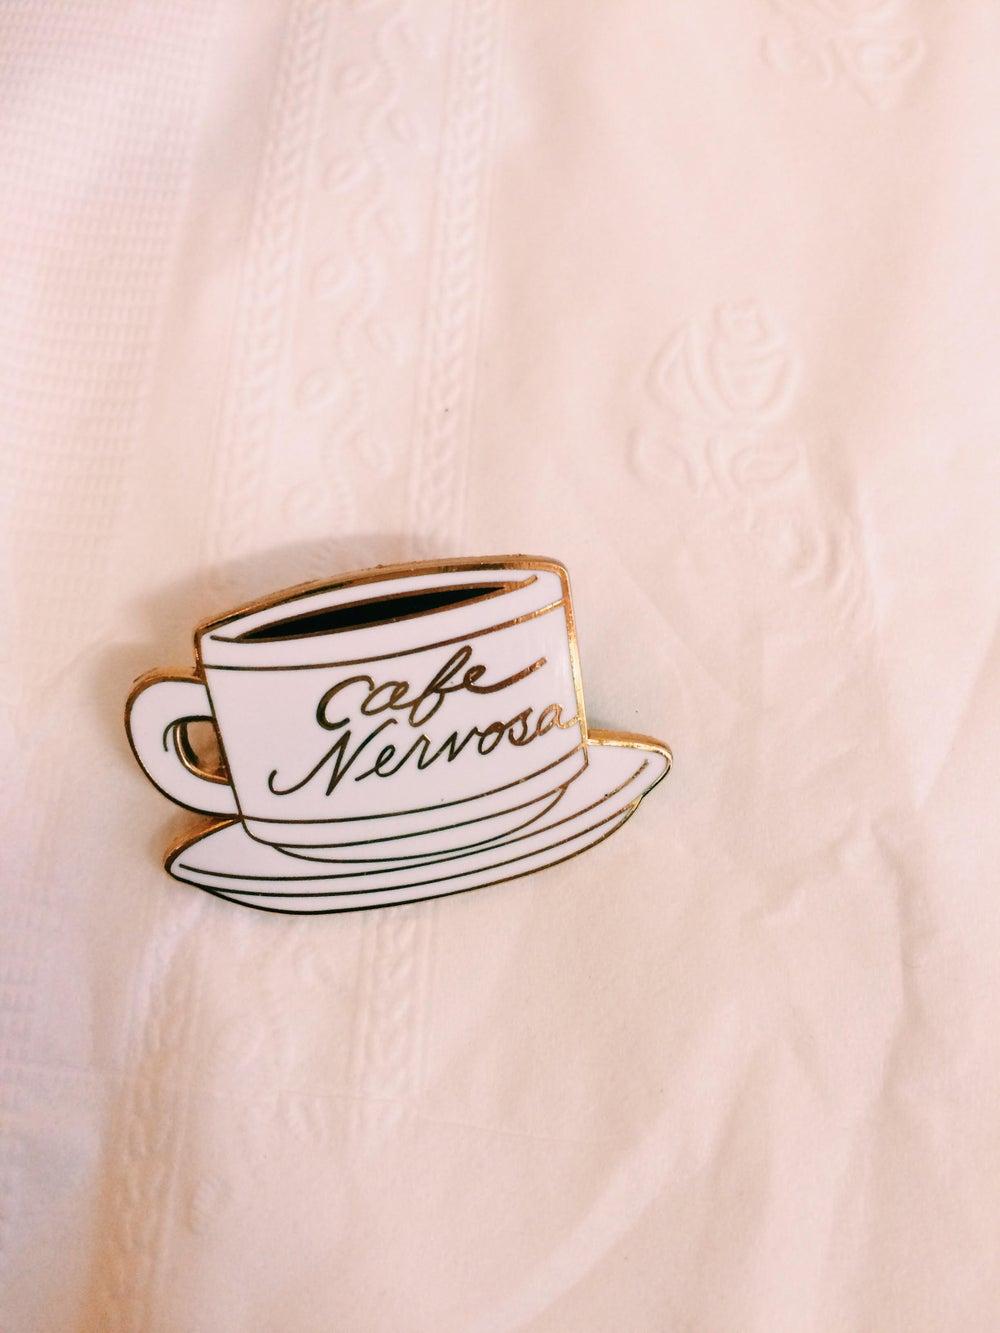 Image of Cafe Nervosa Frasier enamel pin